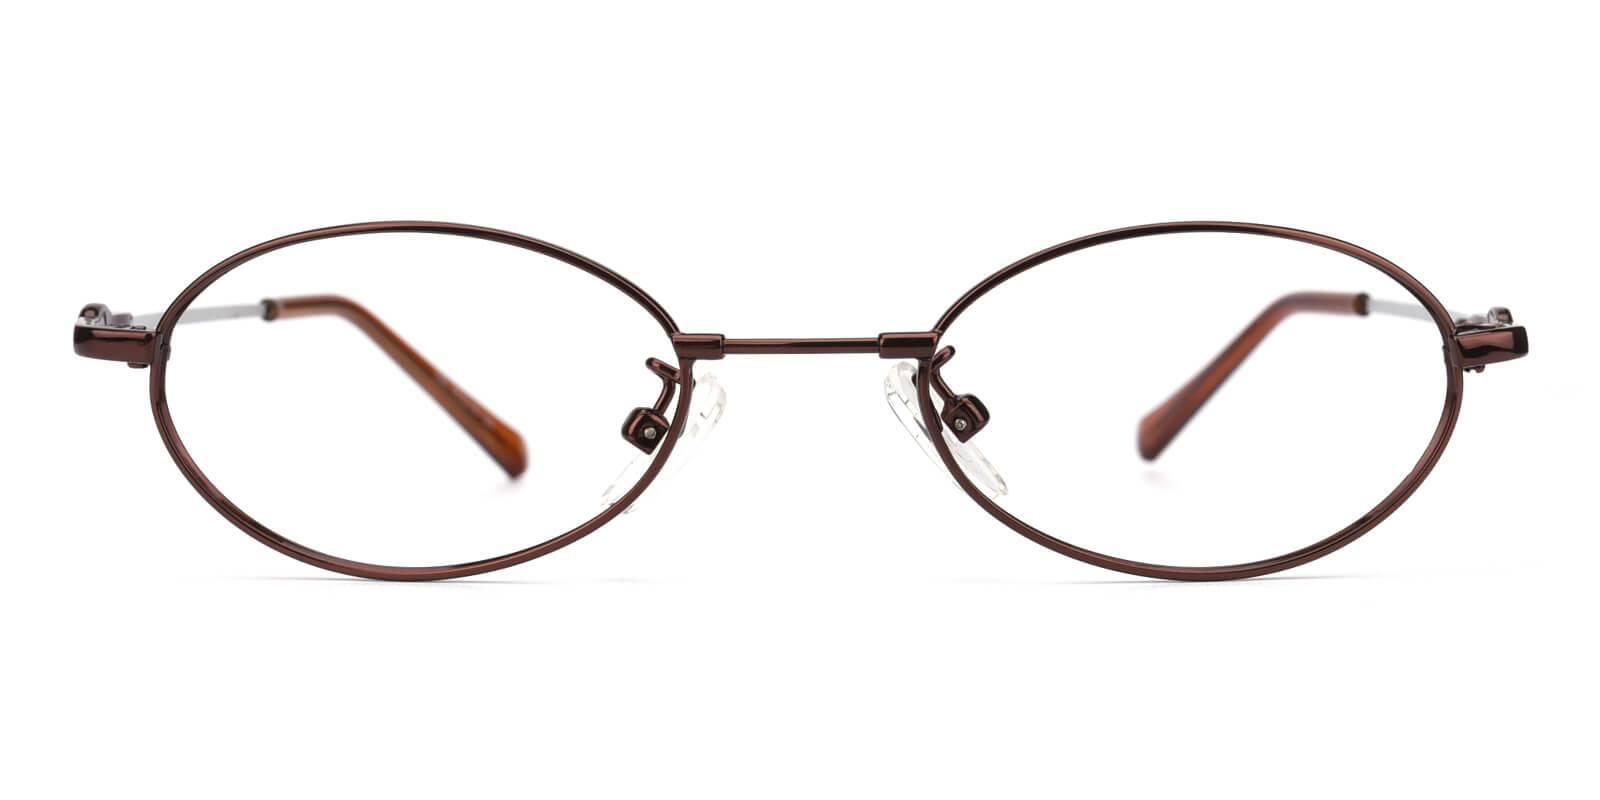 Kola-Brown-Rectangle-Acetate-Eyeglasses-additional2